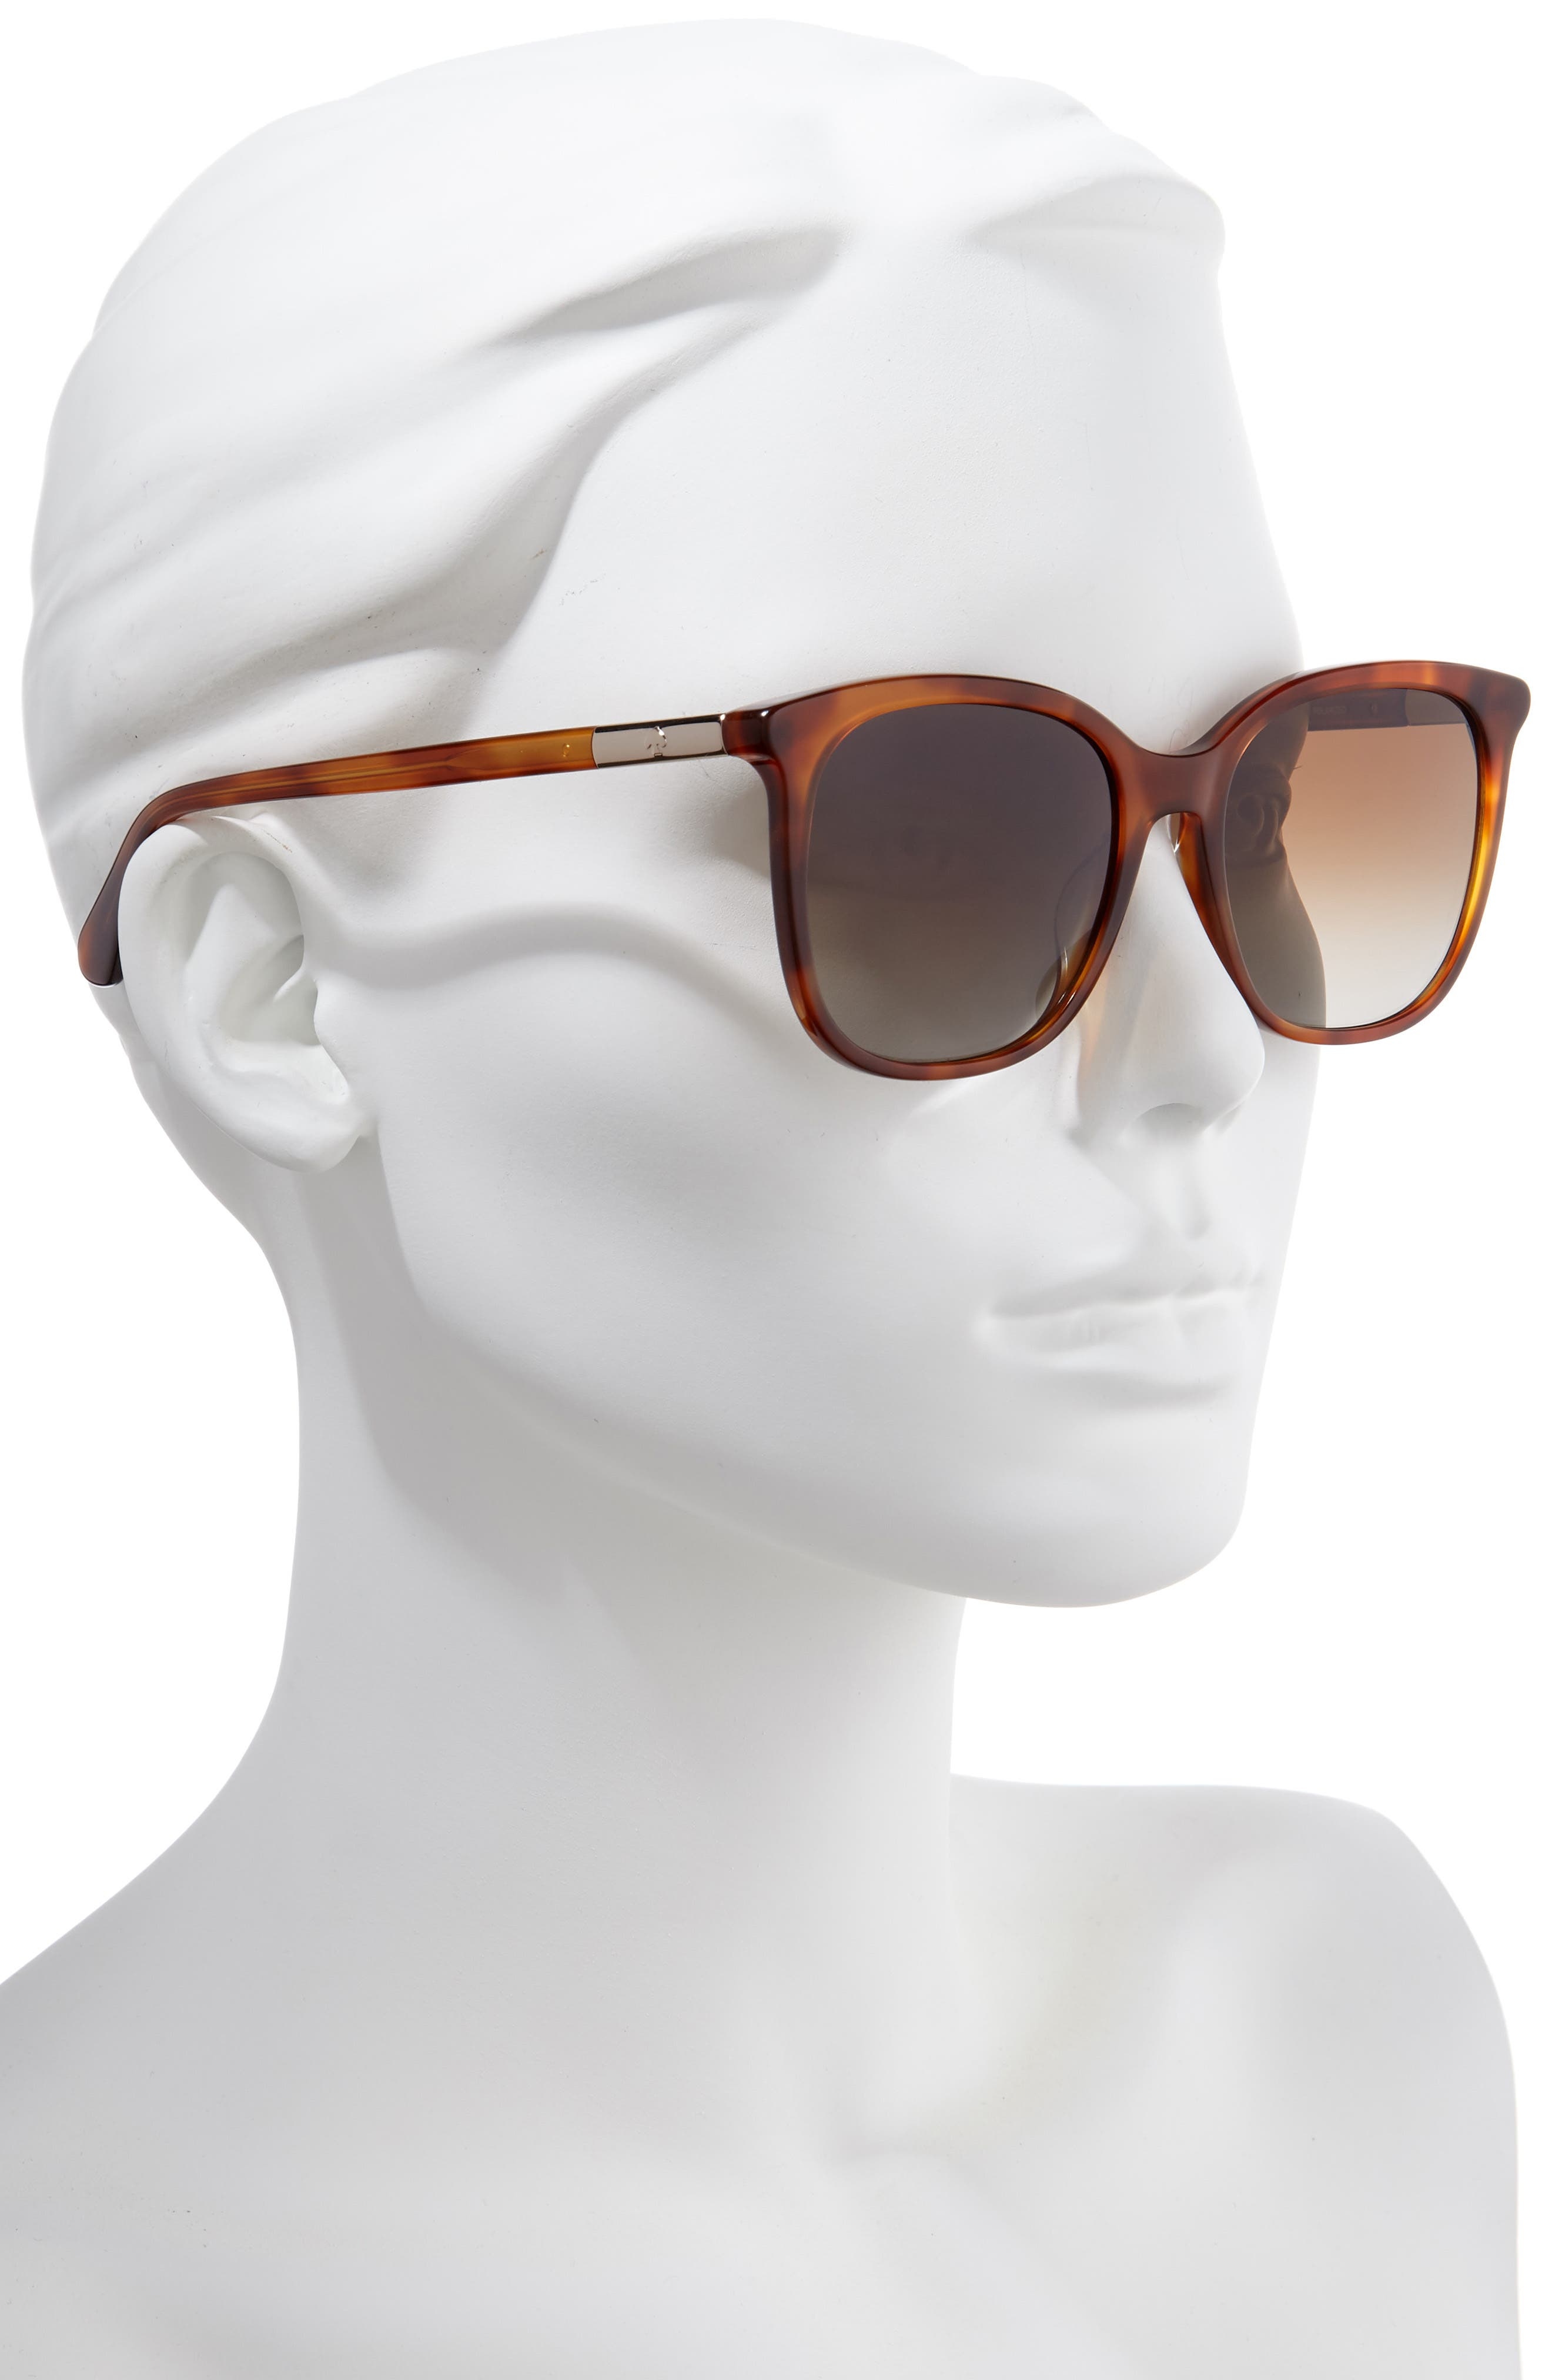 16921401f8ac Women's Sunglasses Sale | Nordstrom